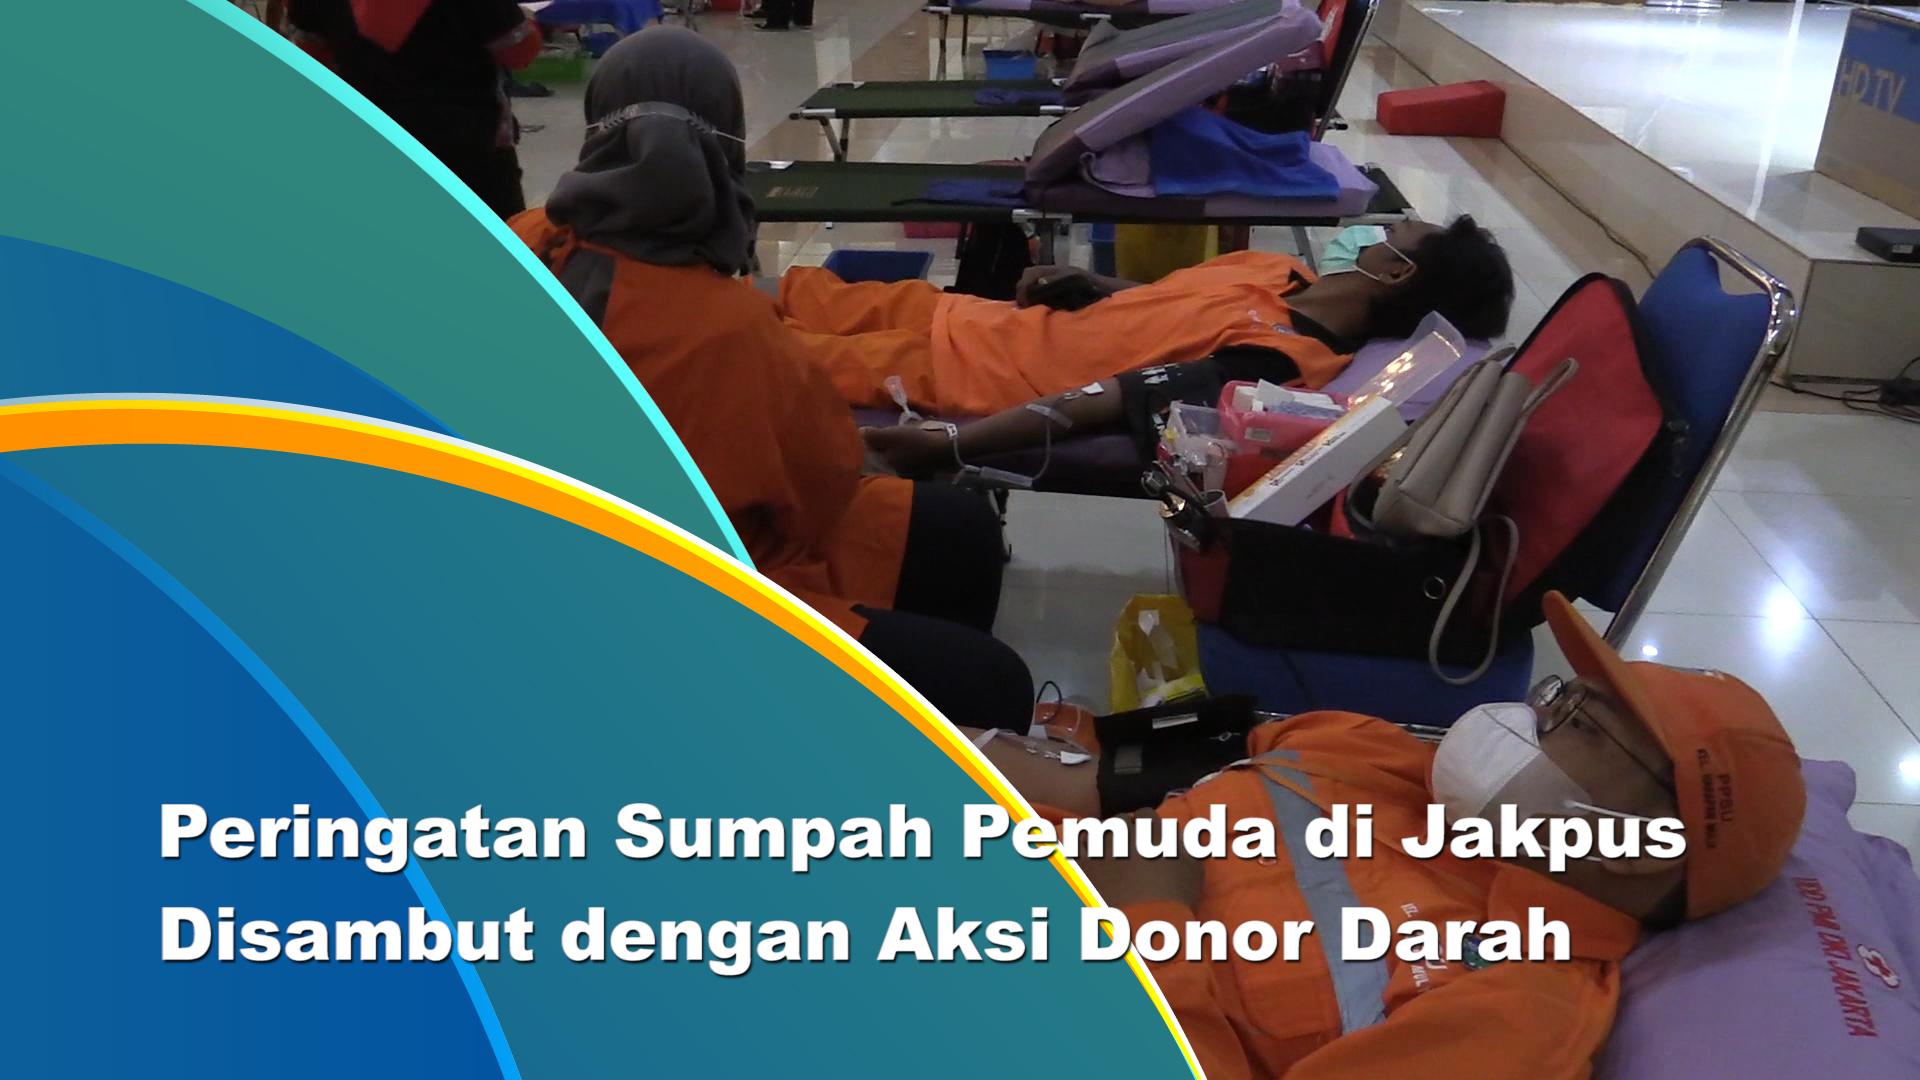 FKDM Jakpus-PMI DKI Gelar Aksi Donor Darah